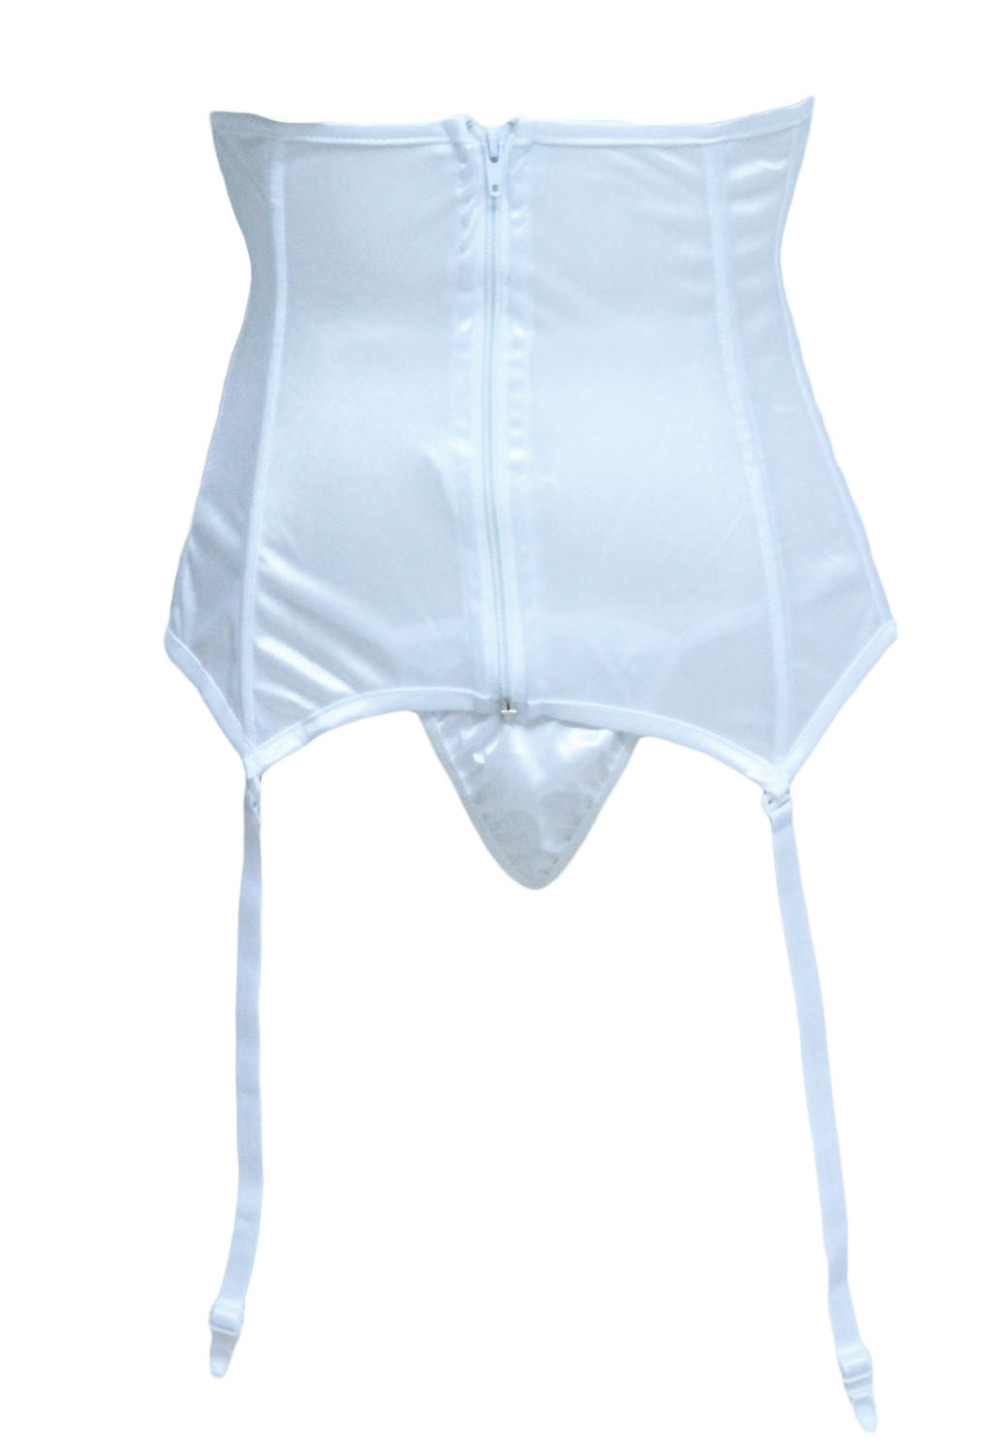 Black Wedding Garter Bridal High Waist Cincher Garters Belts Stockings Suspenders 6 Straps Underbust Belt In From Womens